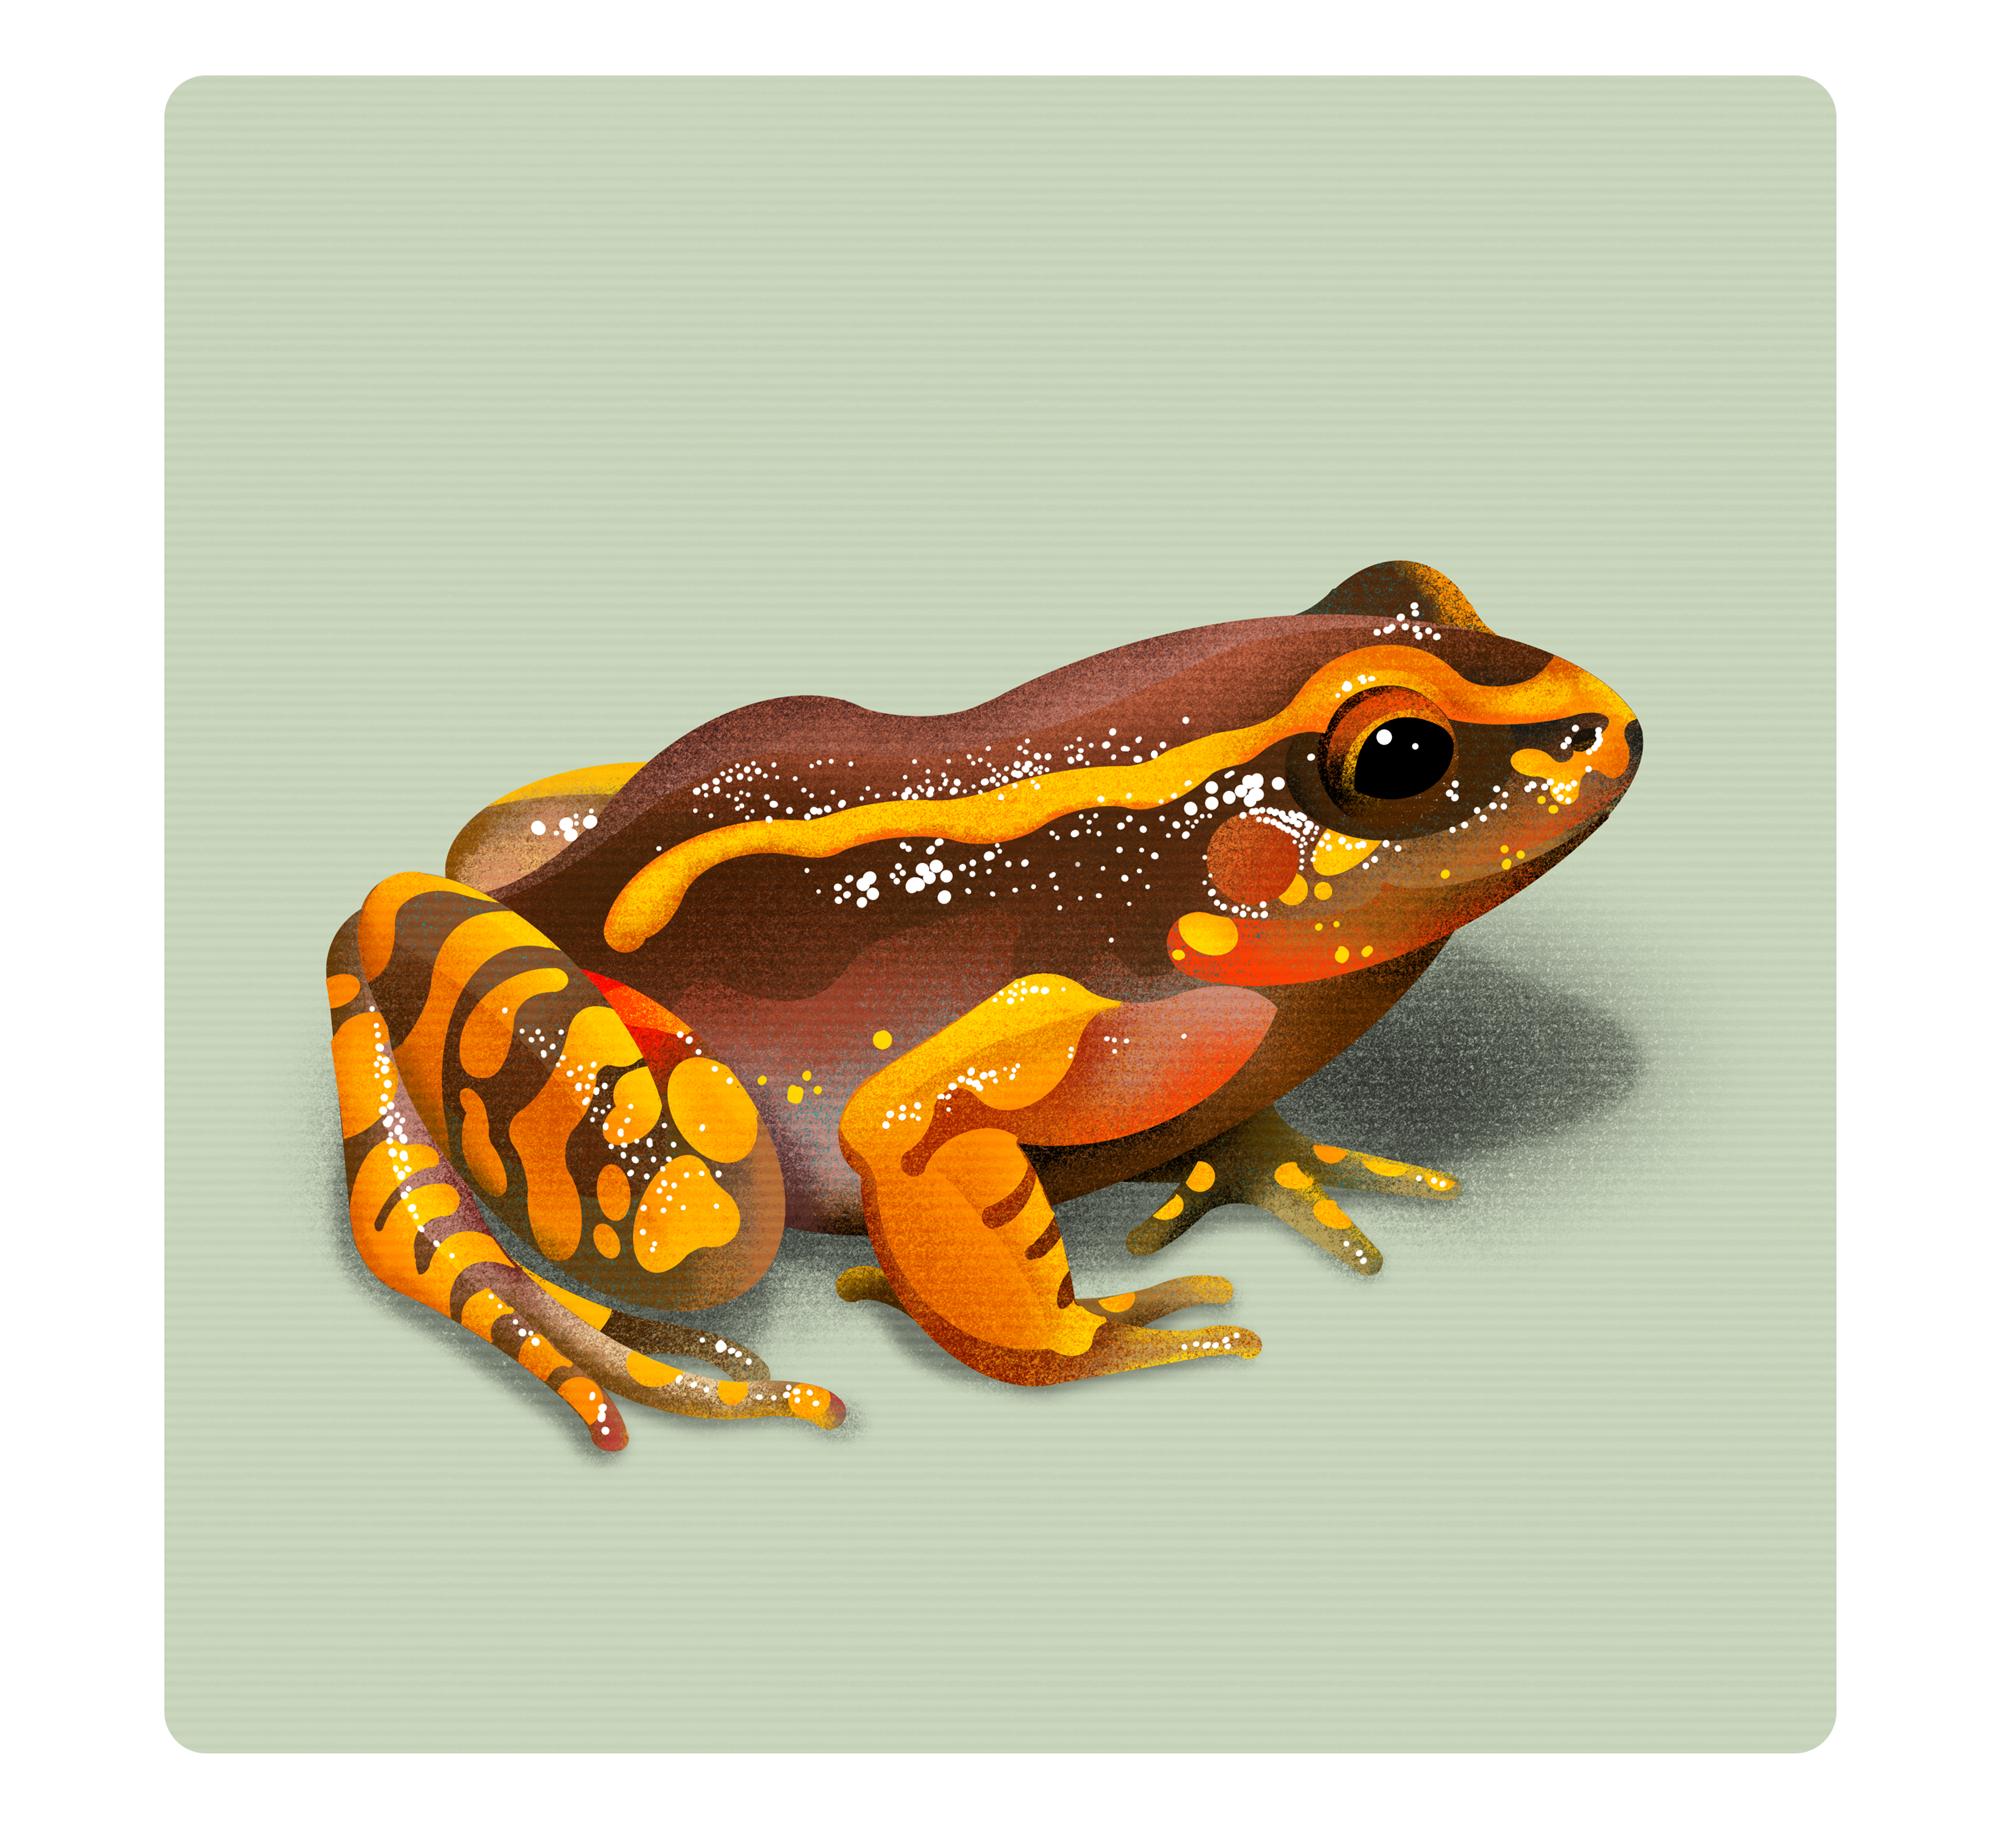 Frog Illustrations |  | Makemark